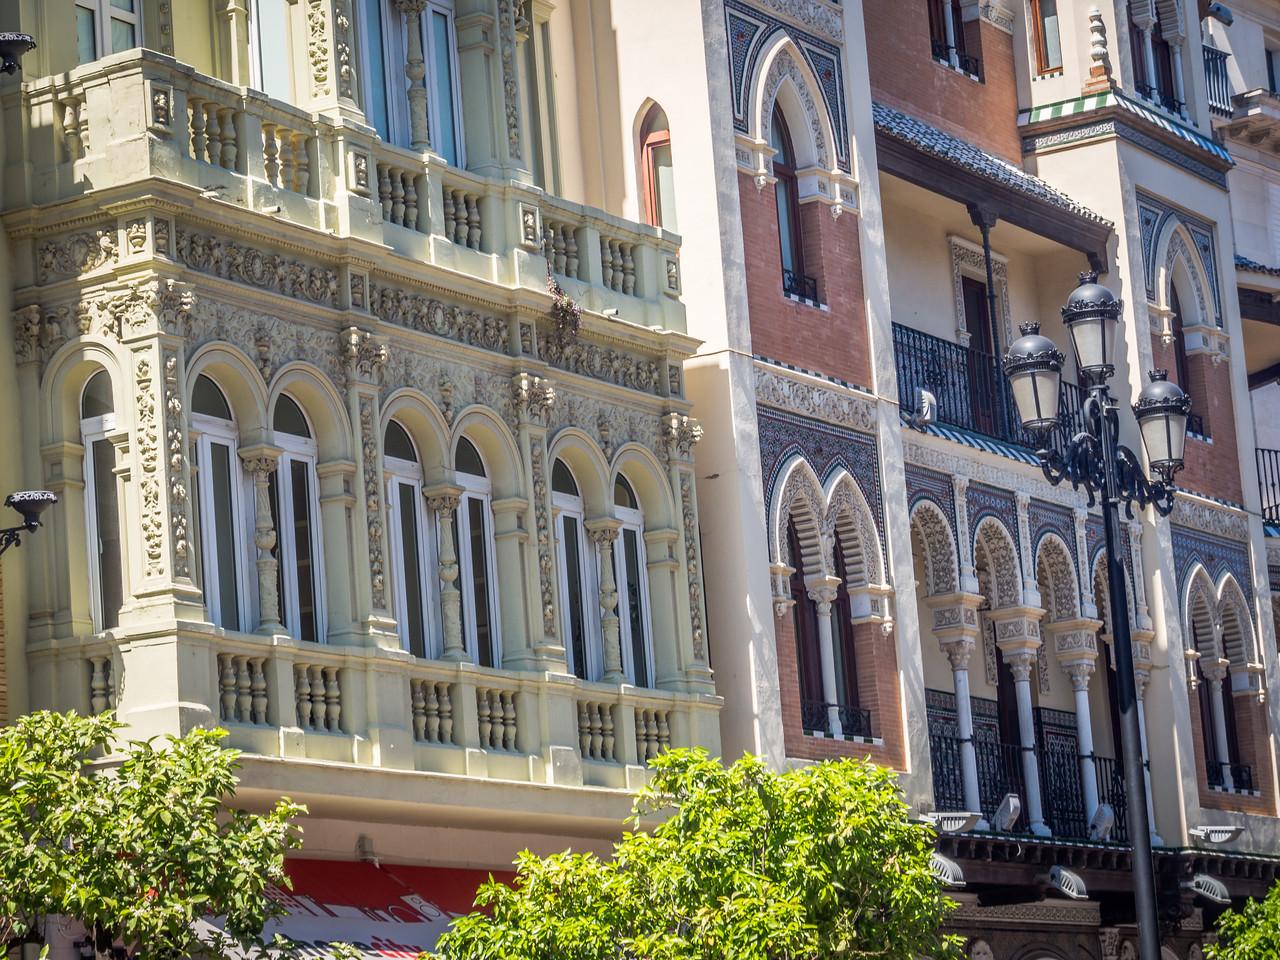 Façades Along Avenide de la Constitucion, Seville